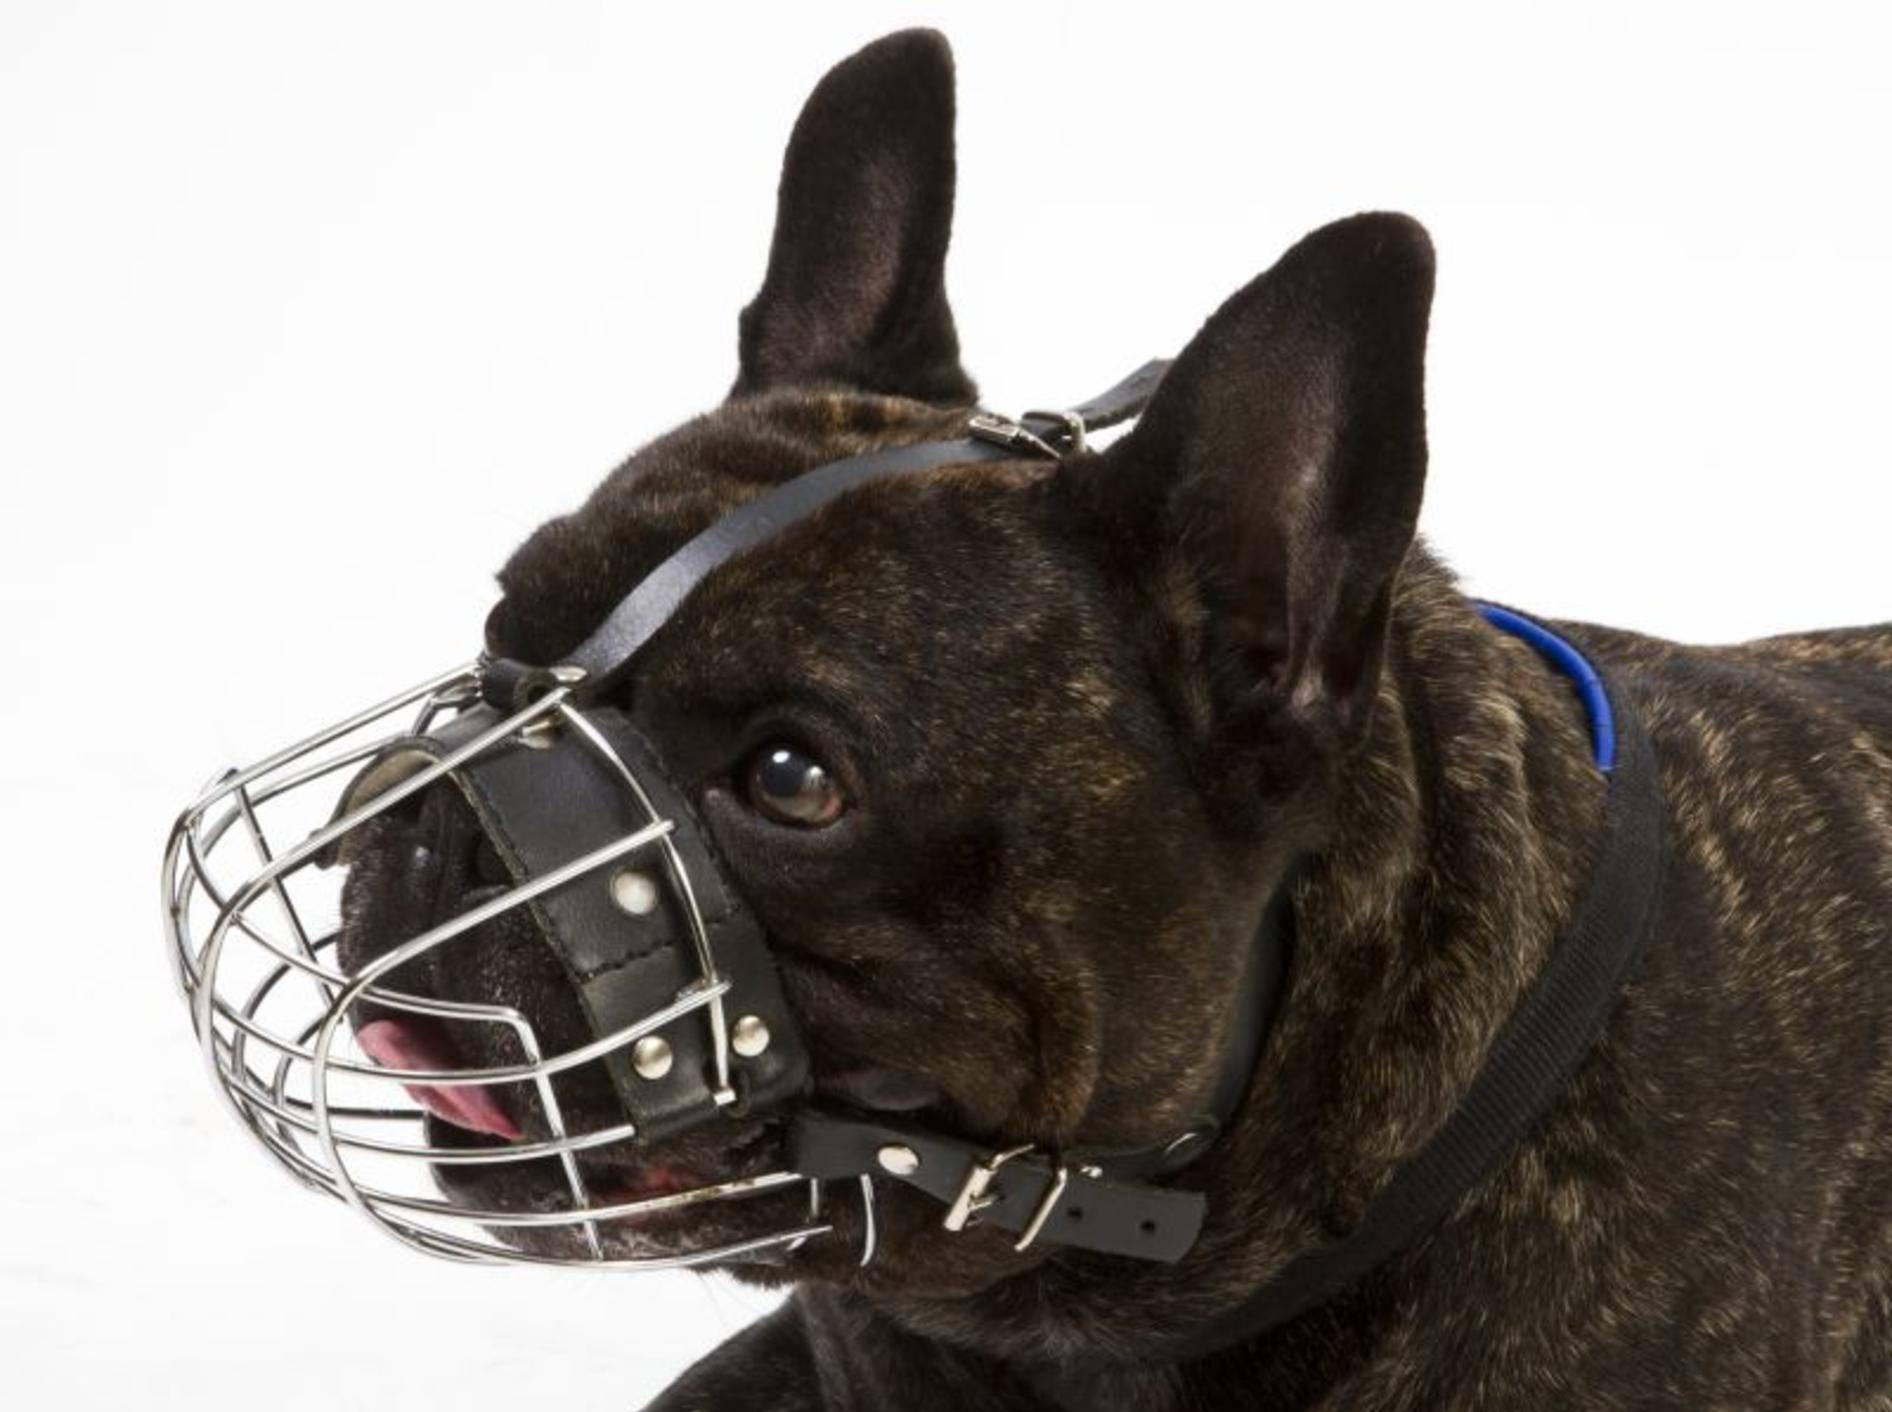 Französische Bulldogge mit Maulkorb – Shutterstock / spflaum